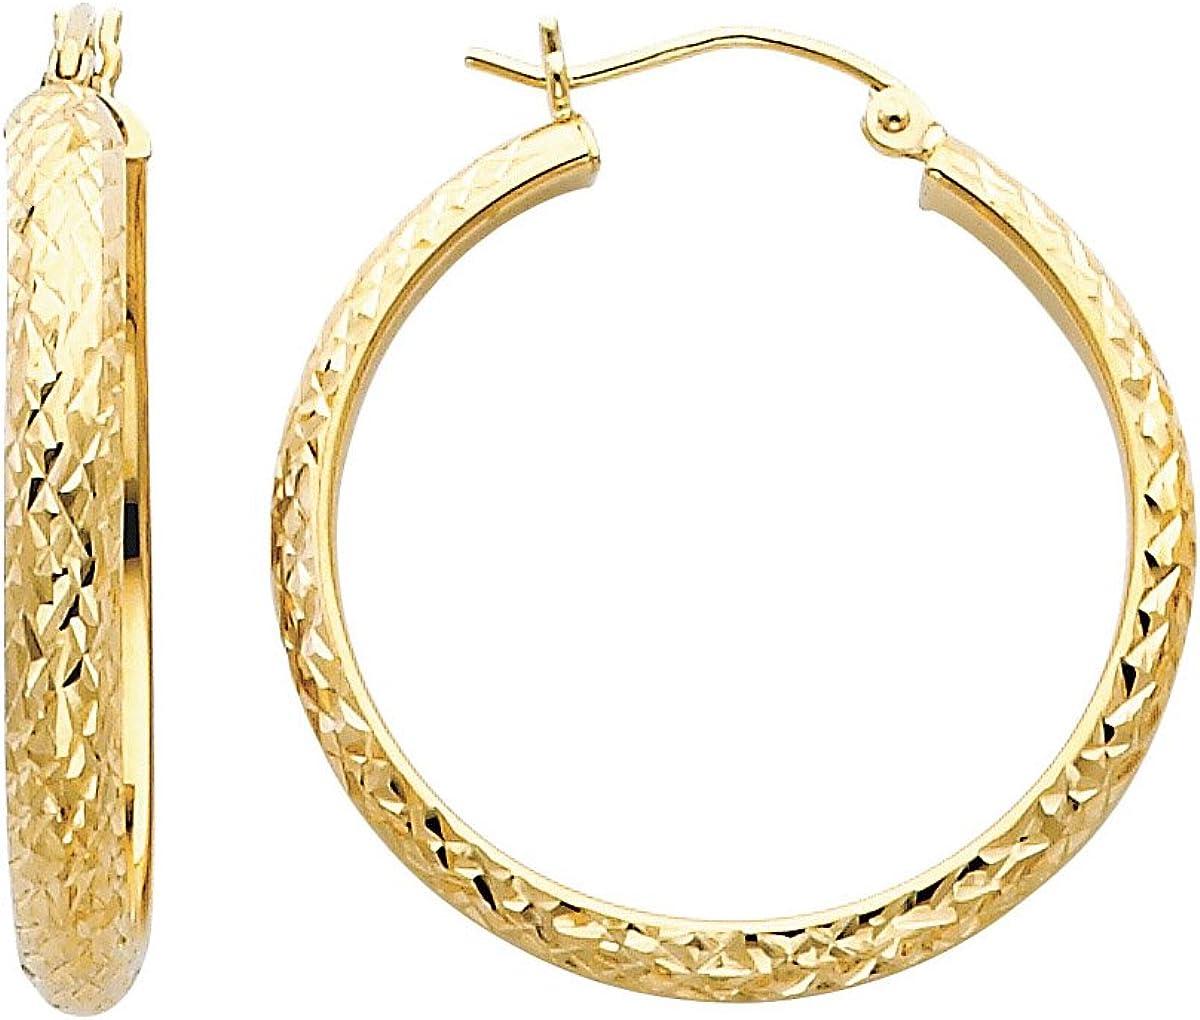 TGDJ 14K Yellow Gold 3.5mm Diamond Cut Hoop Earrings - (Diameter - 30mm)